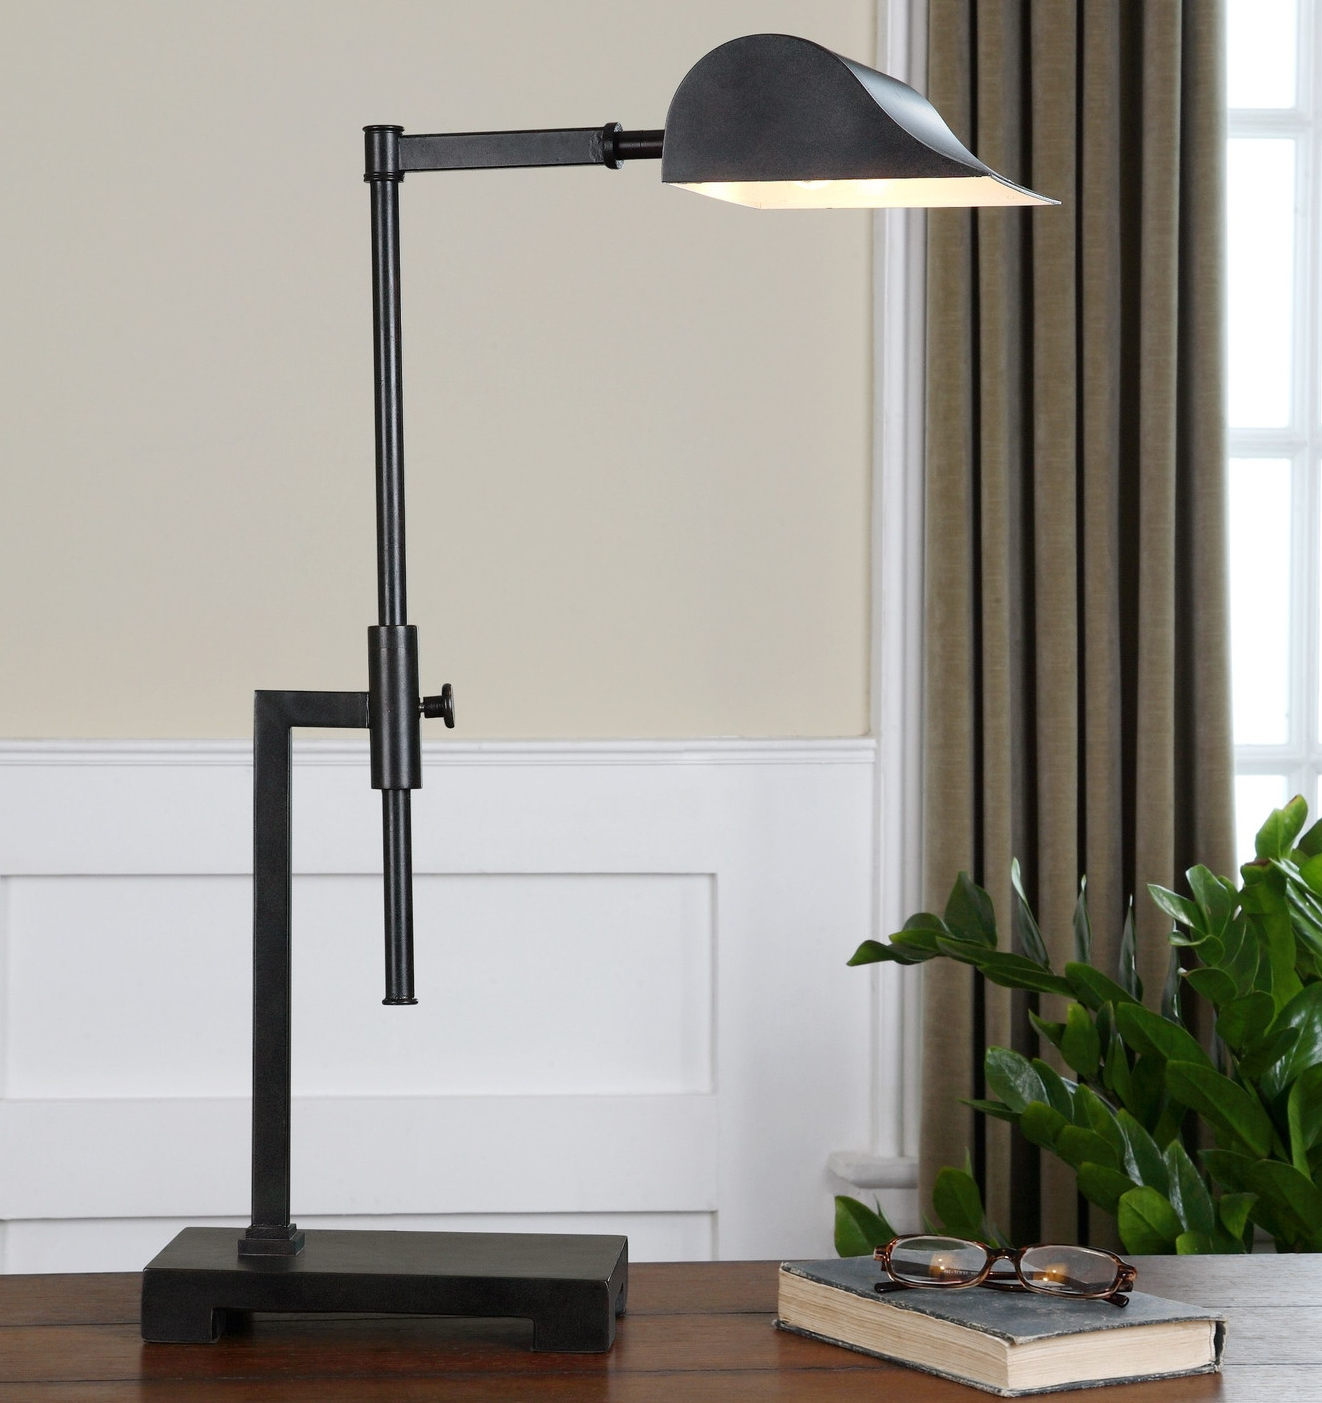 Uttermost-Fiorello-33-H-Table-Lamp-29579-1.jpg